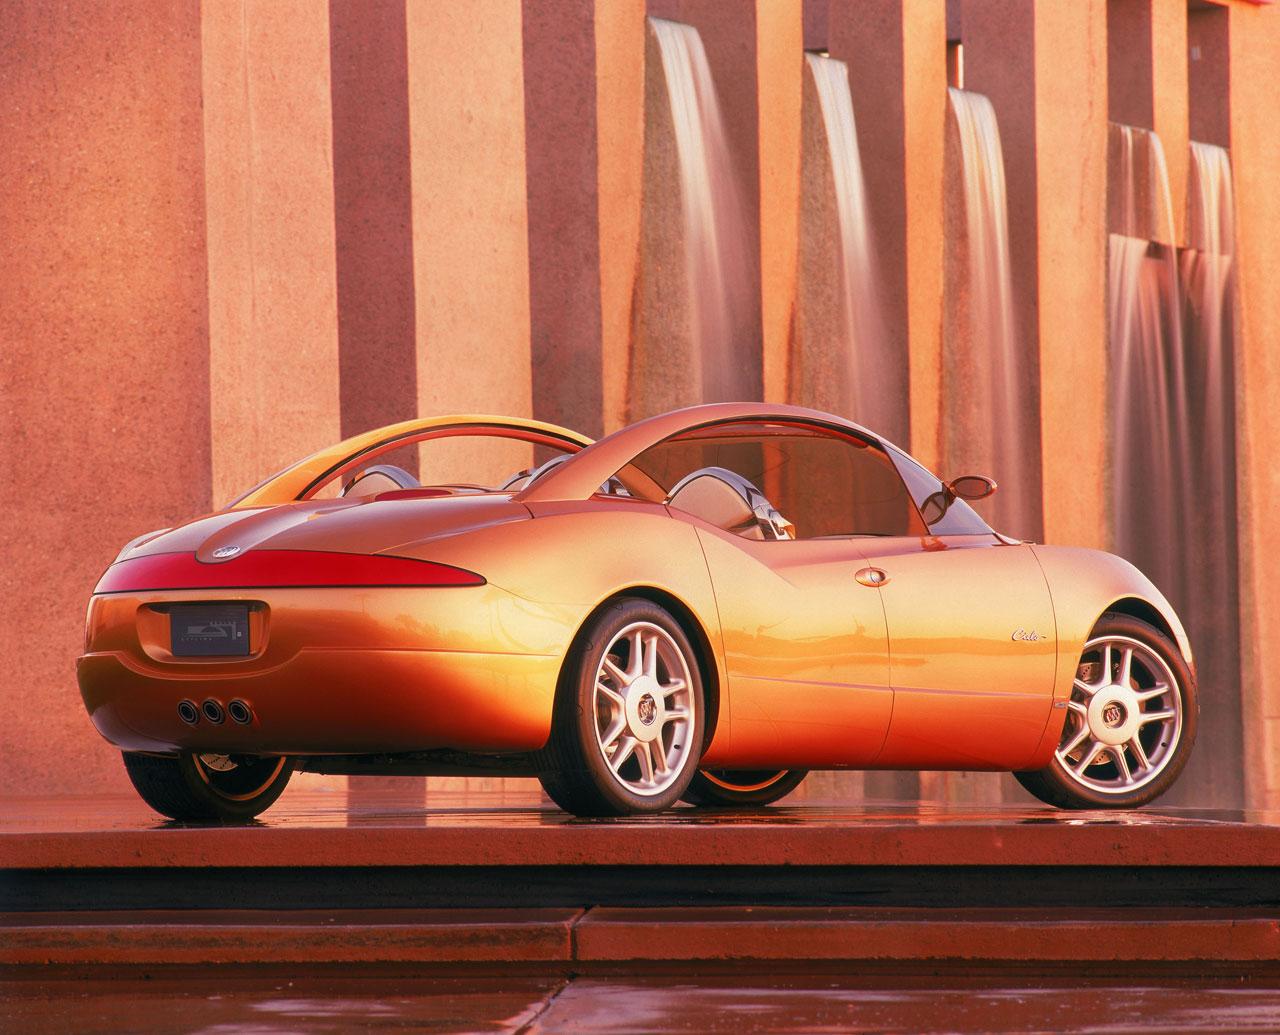 Image 40 Of 49 Pontiac Aztek Concept Car Buick Cielo 1951 Xp 300 1999 Body Design